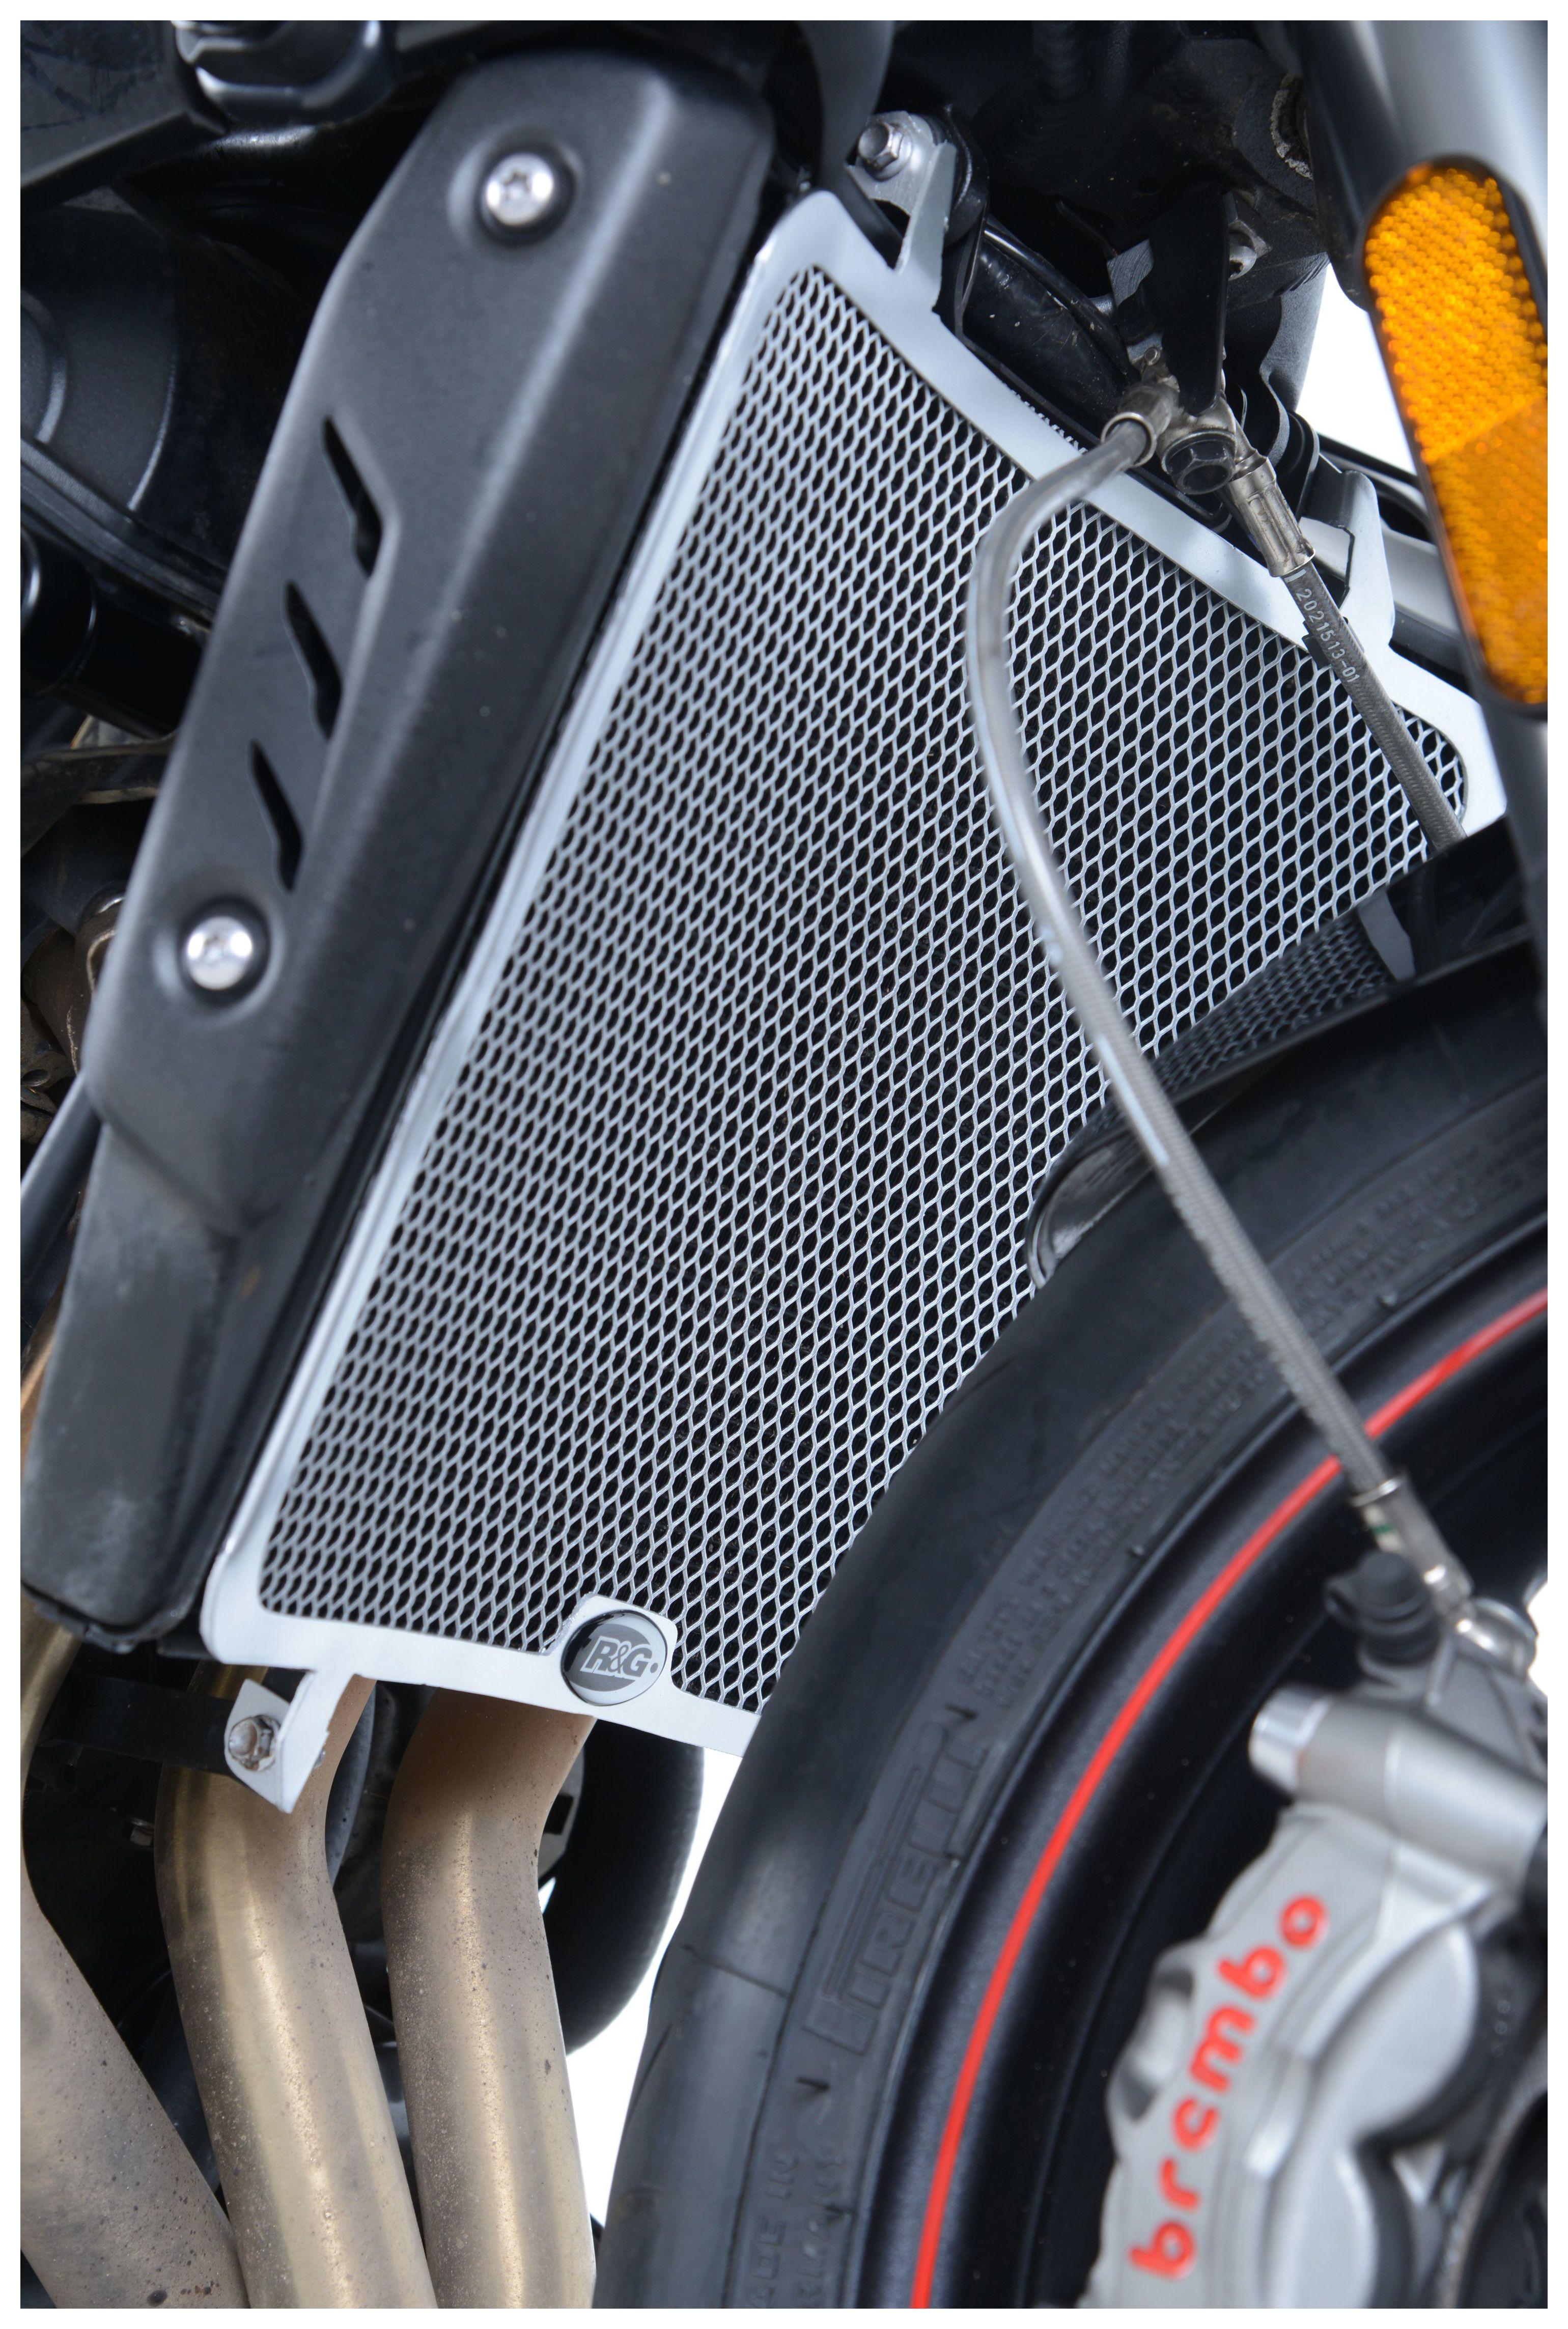 Triumph Daytona 675 2013-2017 Evotech Performance Radiator Guard